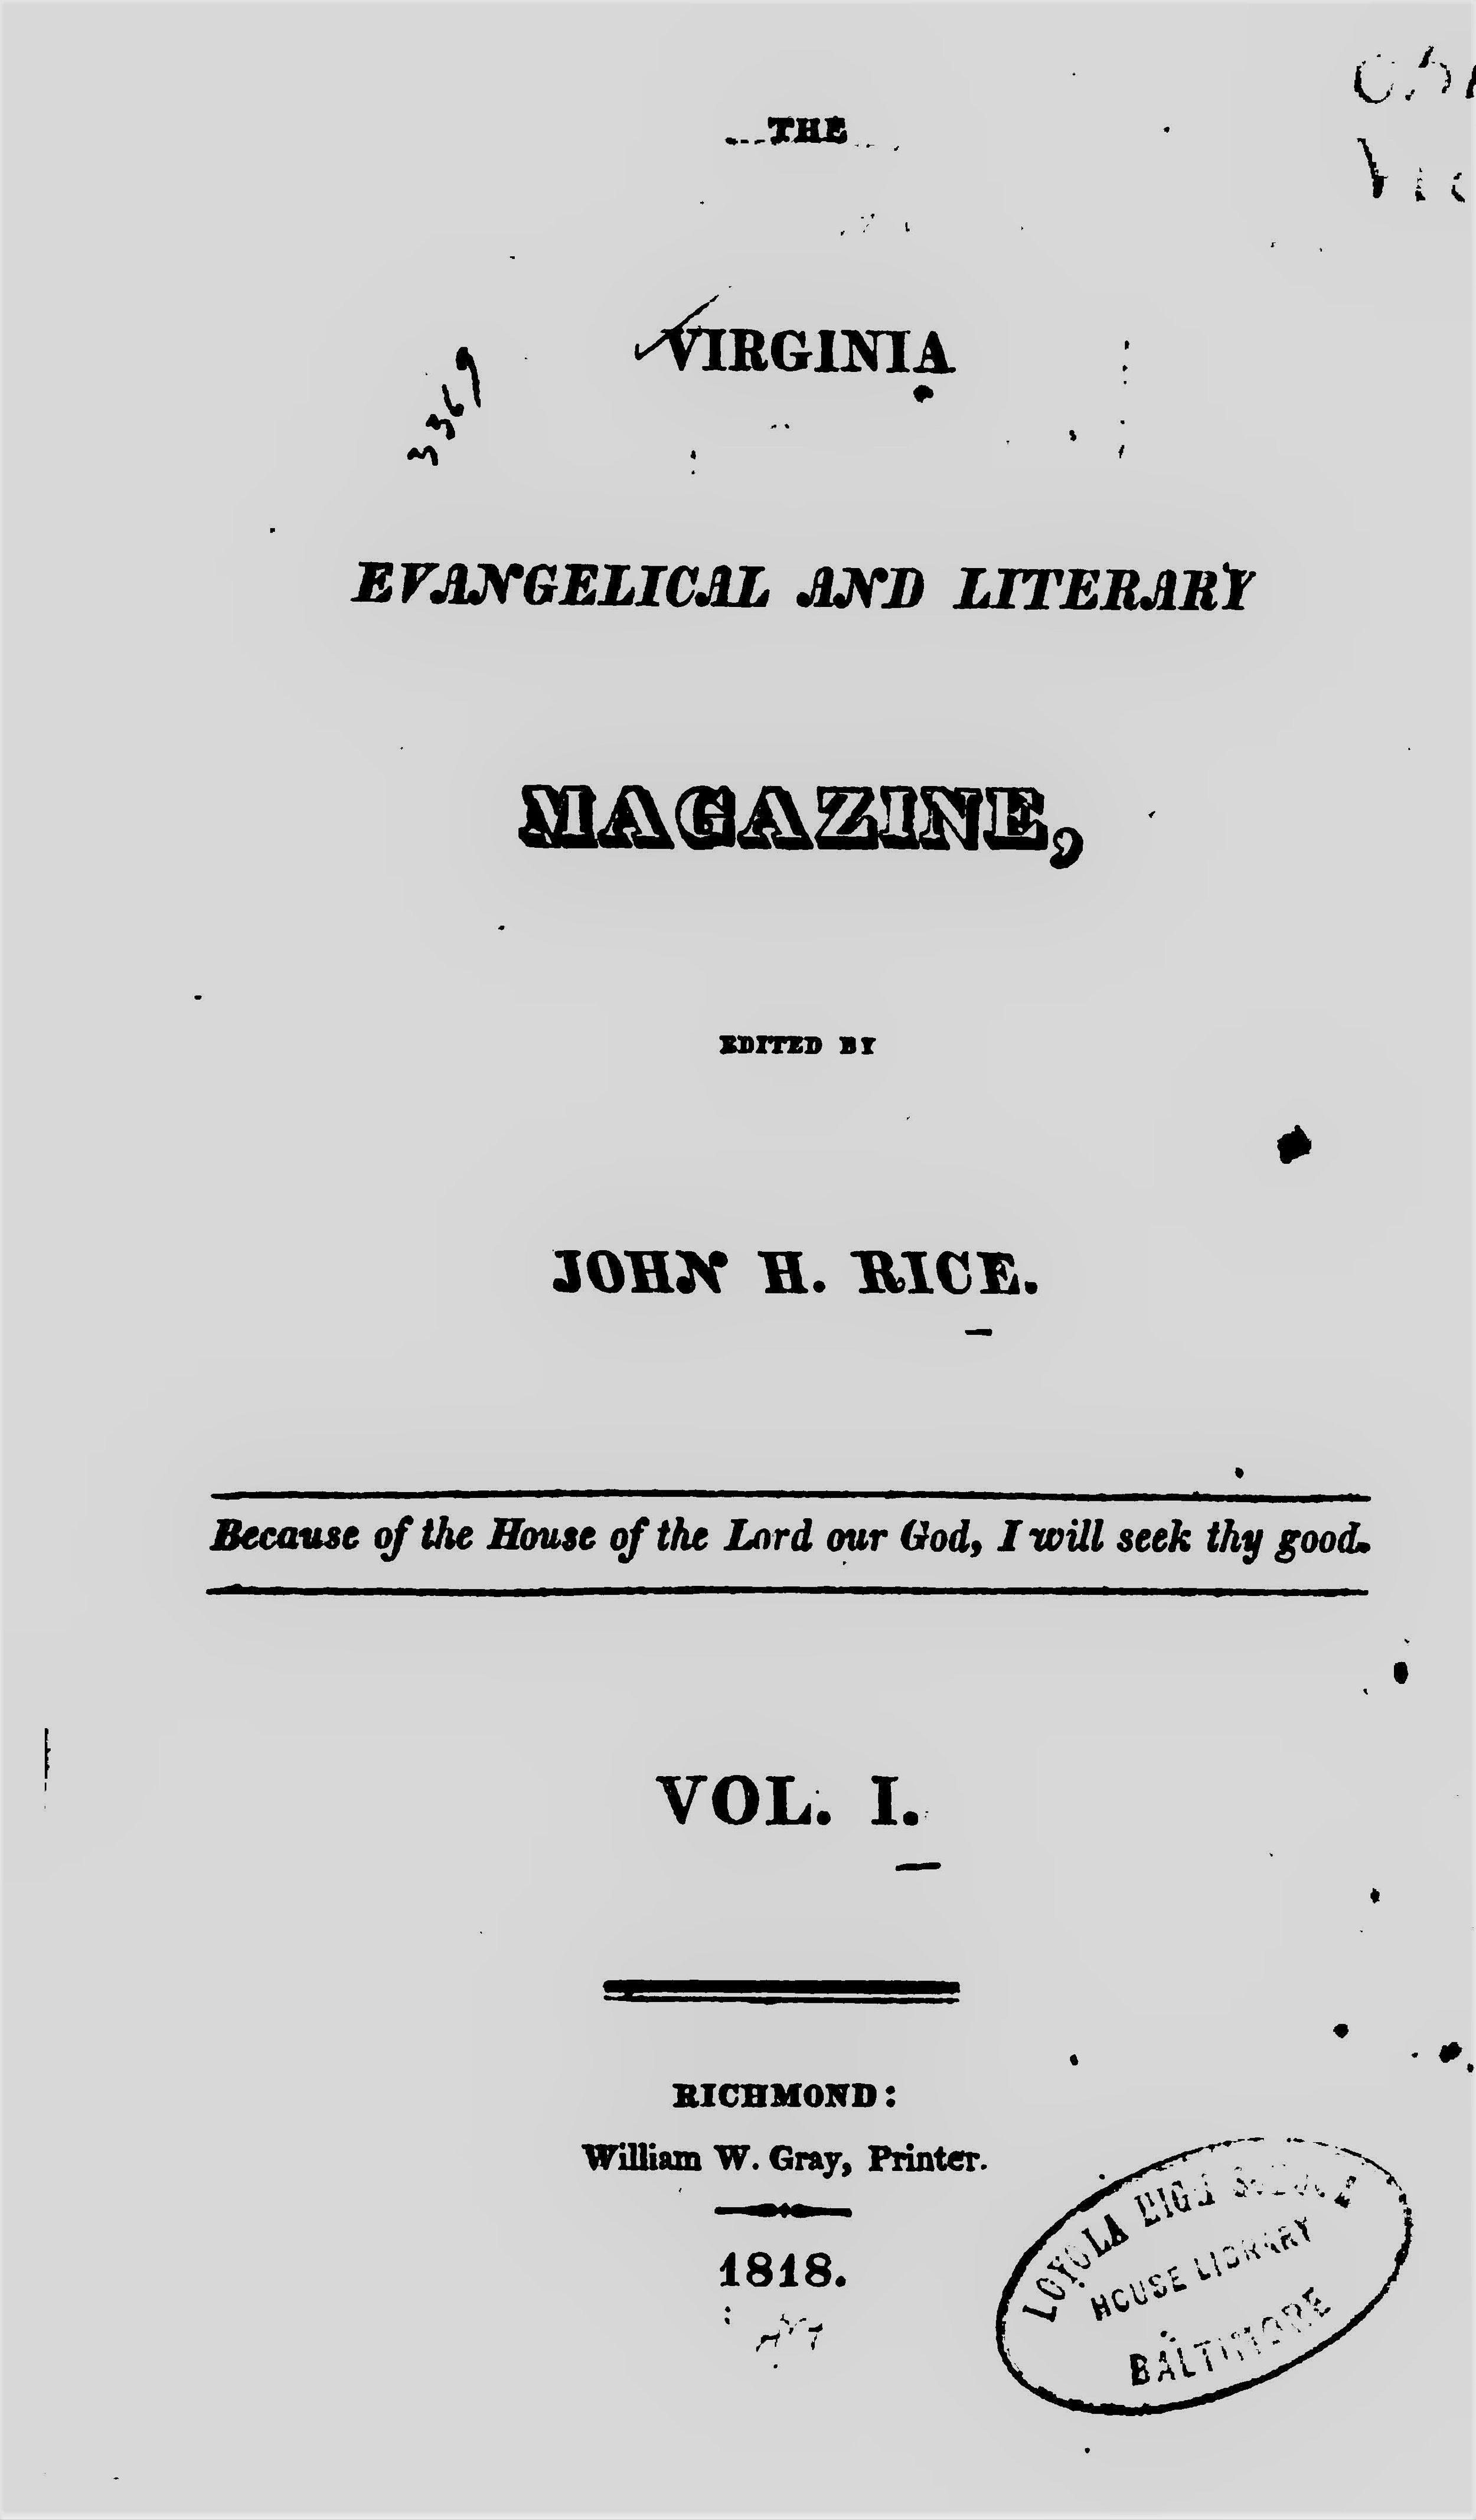 Rice, John Holt - Virgina Evangelical and Literary Magazine Vol 1.jpg